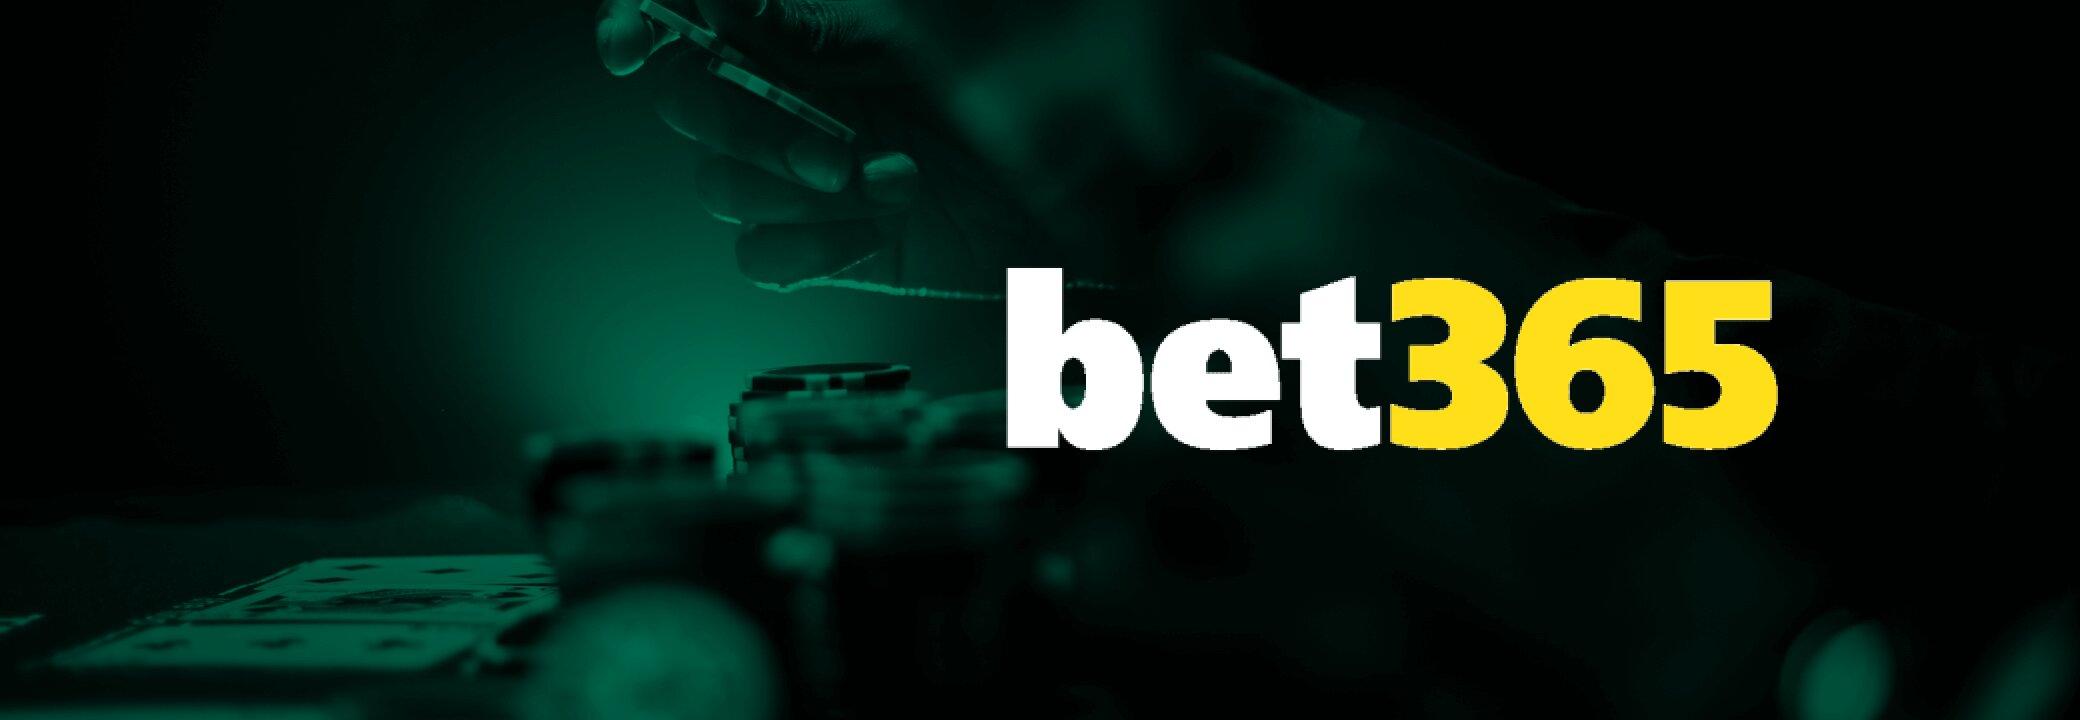 Bet365 casino login